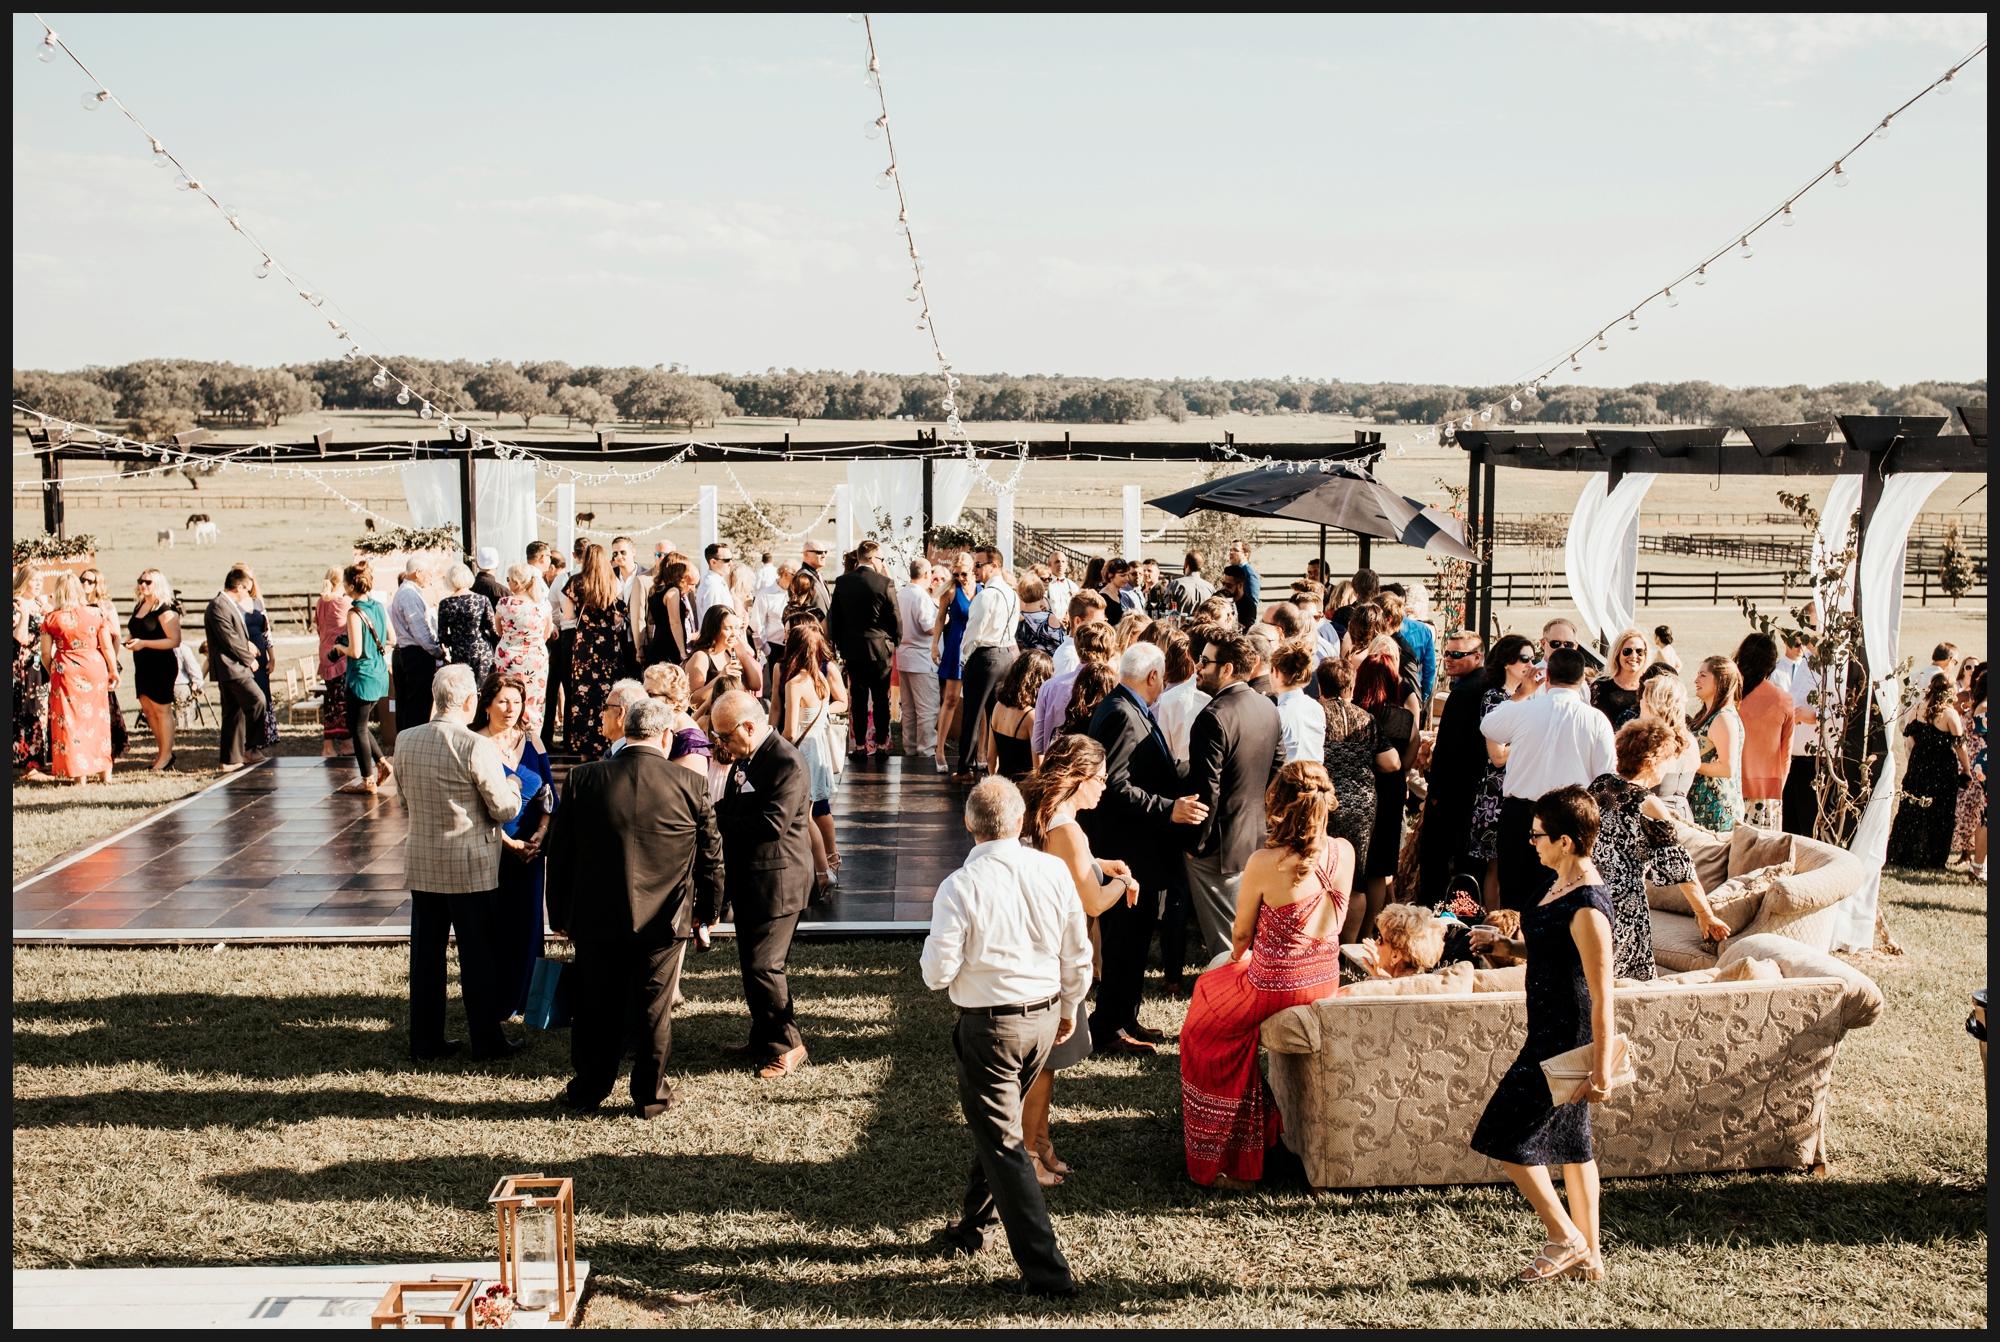 Orlando-Wedding-Photographer-destination-wedding-photographer-florida-wedding-photographer-hawaii-wedding-photographer_0600.jpg